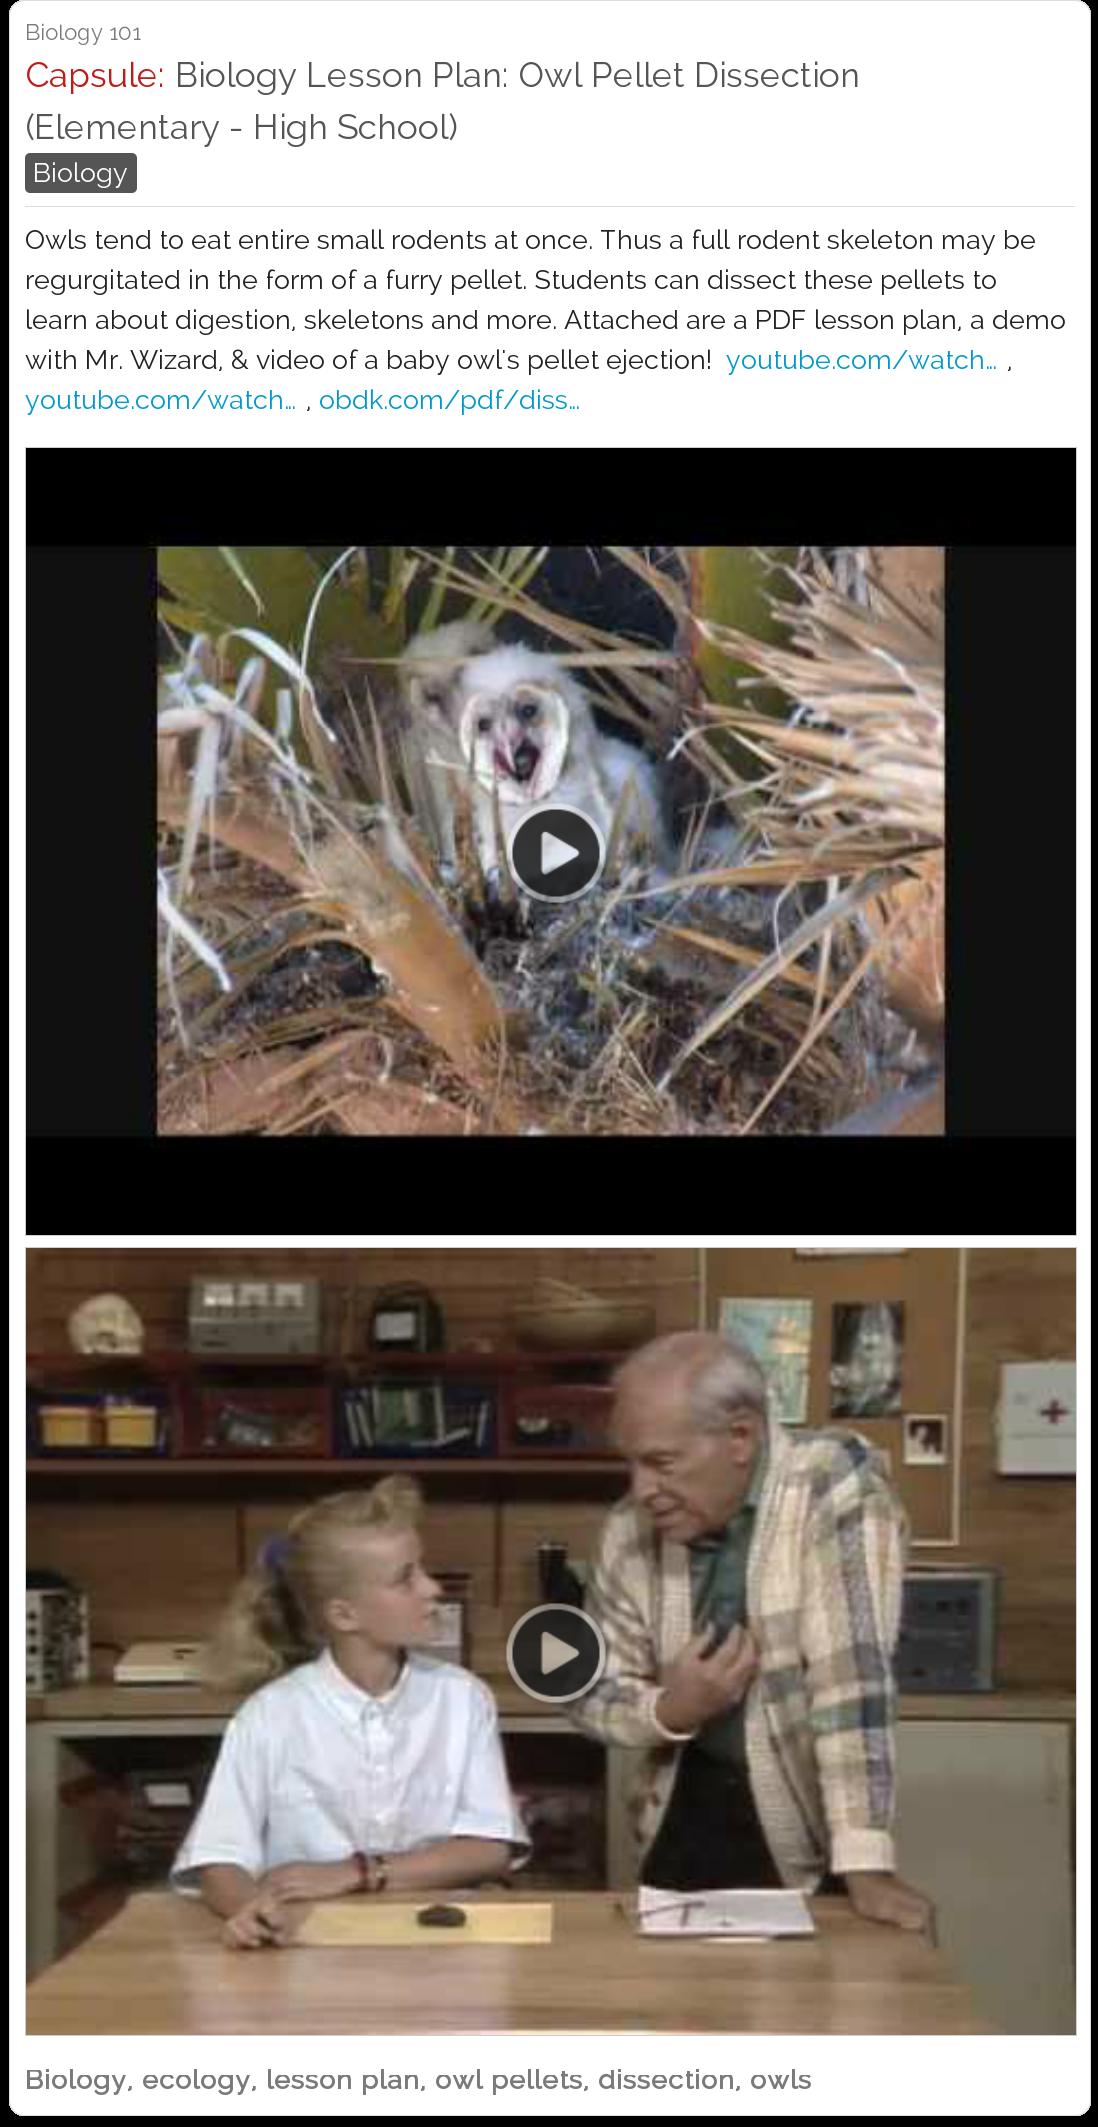 Biology Lesson Plan Owl Pellet Dissection Elementary